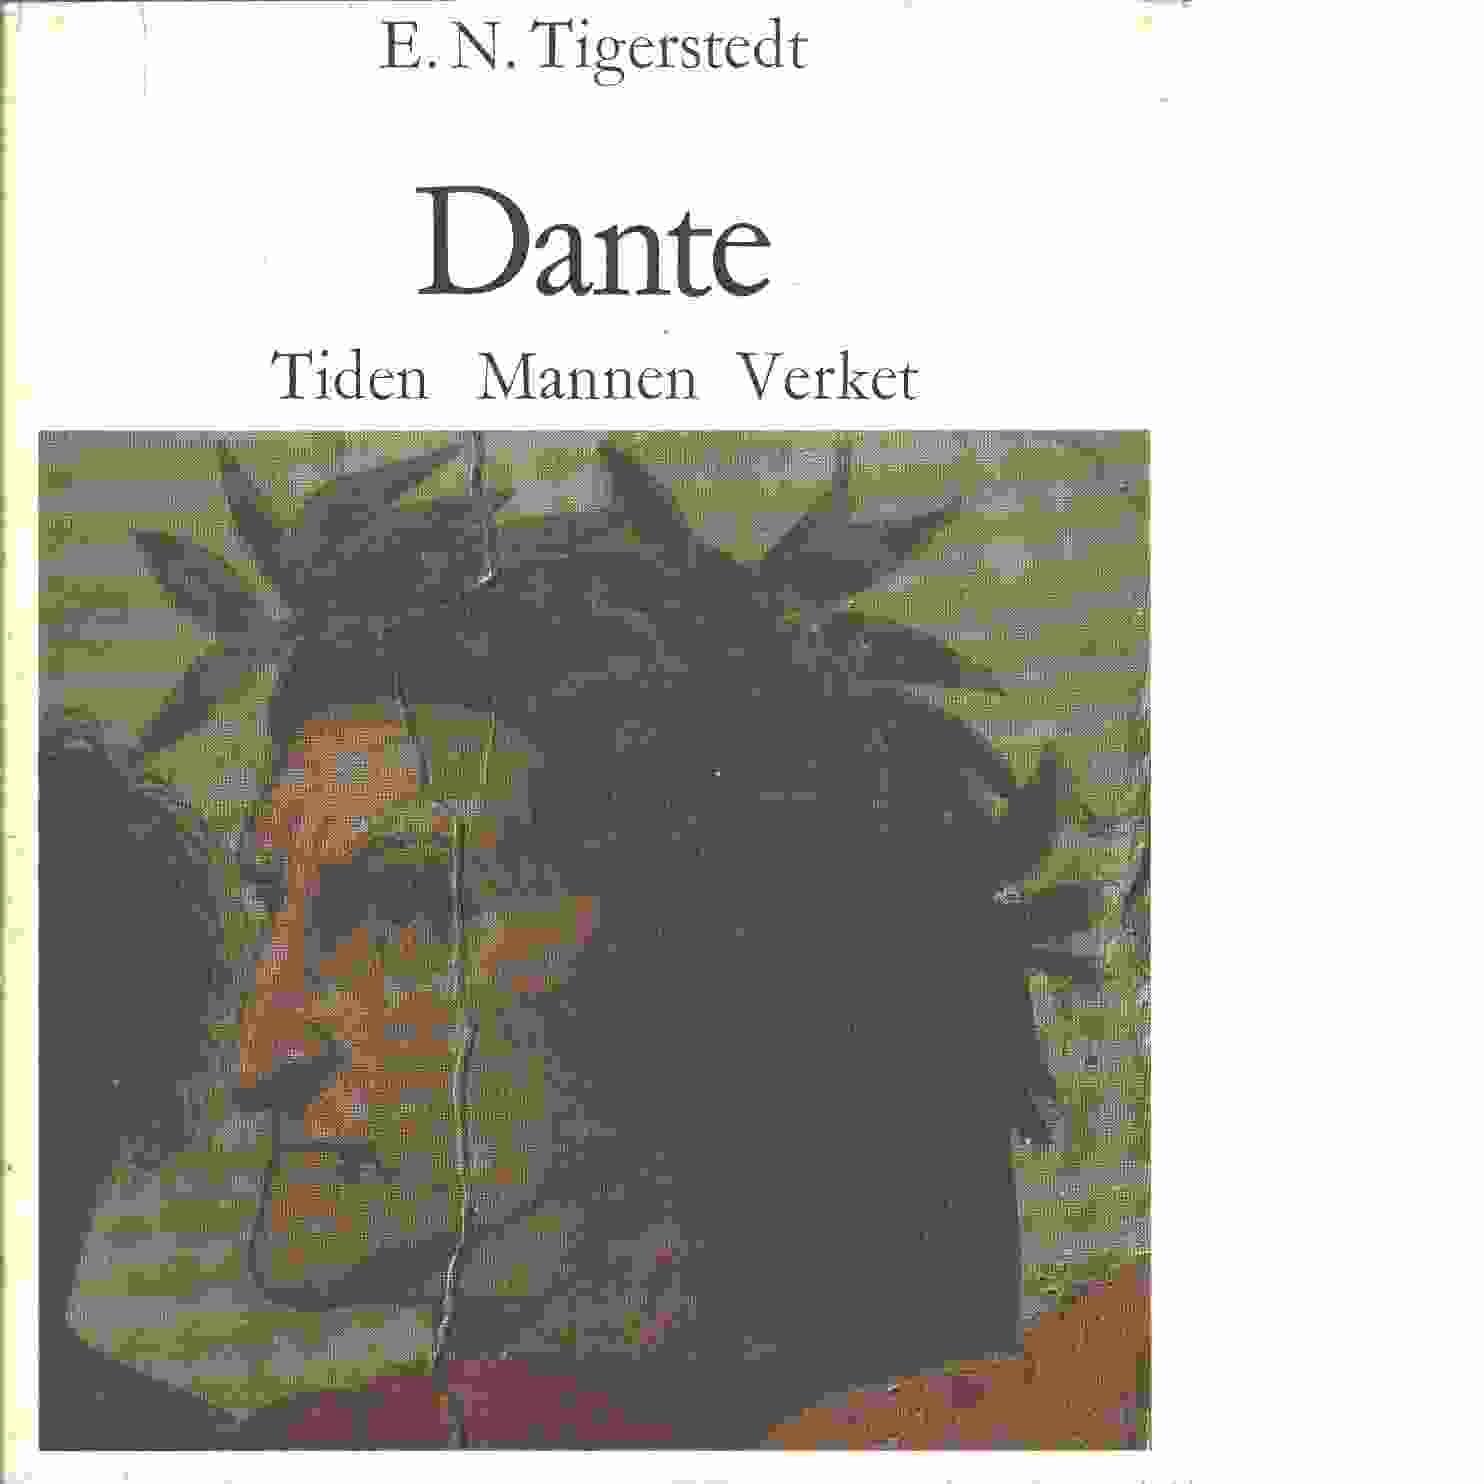 Dante : tiden, mannen, verket - Tigerstedt, Eugène Napoleon